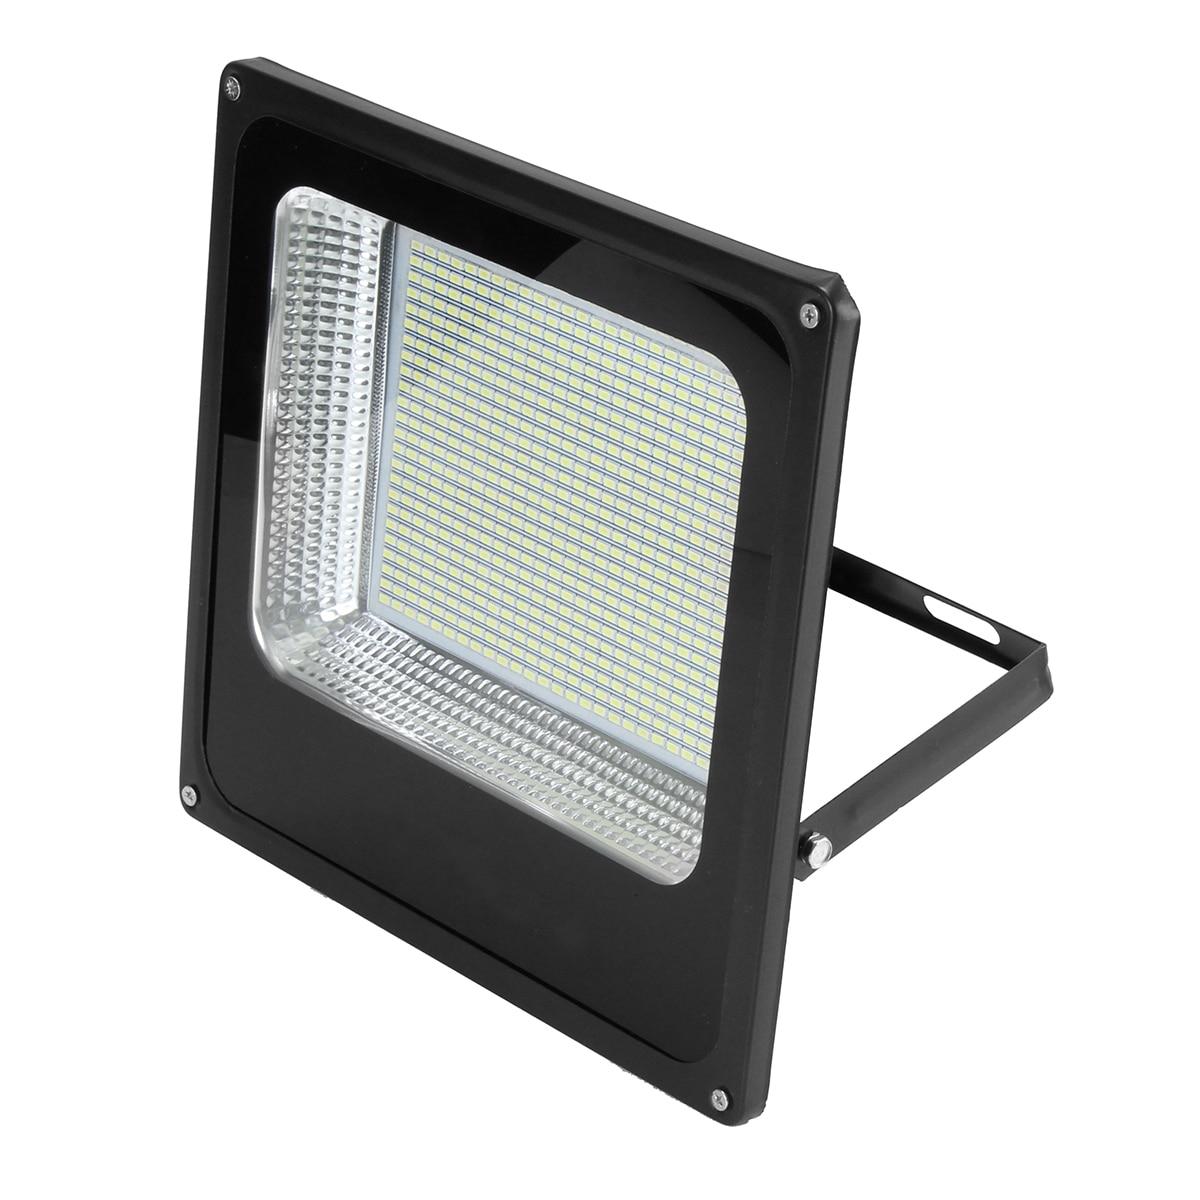 600LED Spotlight Outdoor Lighting 80W 2835SMD LED Wall Washer Lamp Super Bright Security Lights Waterproof Led Flood Light цена